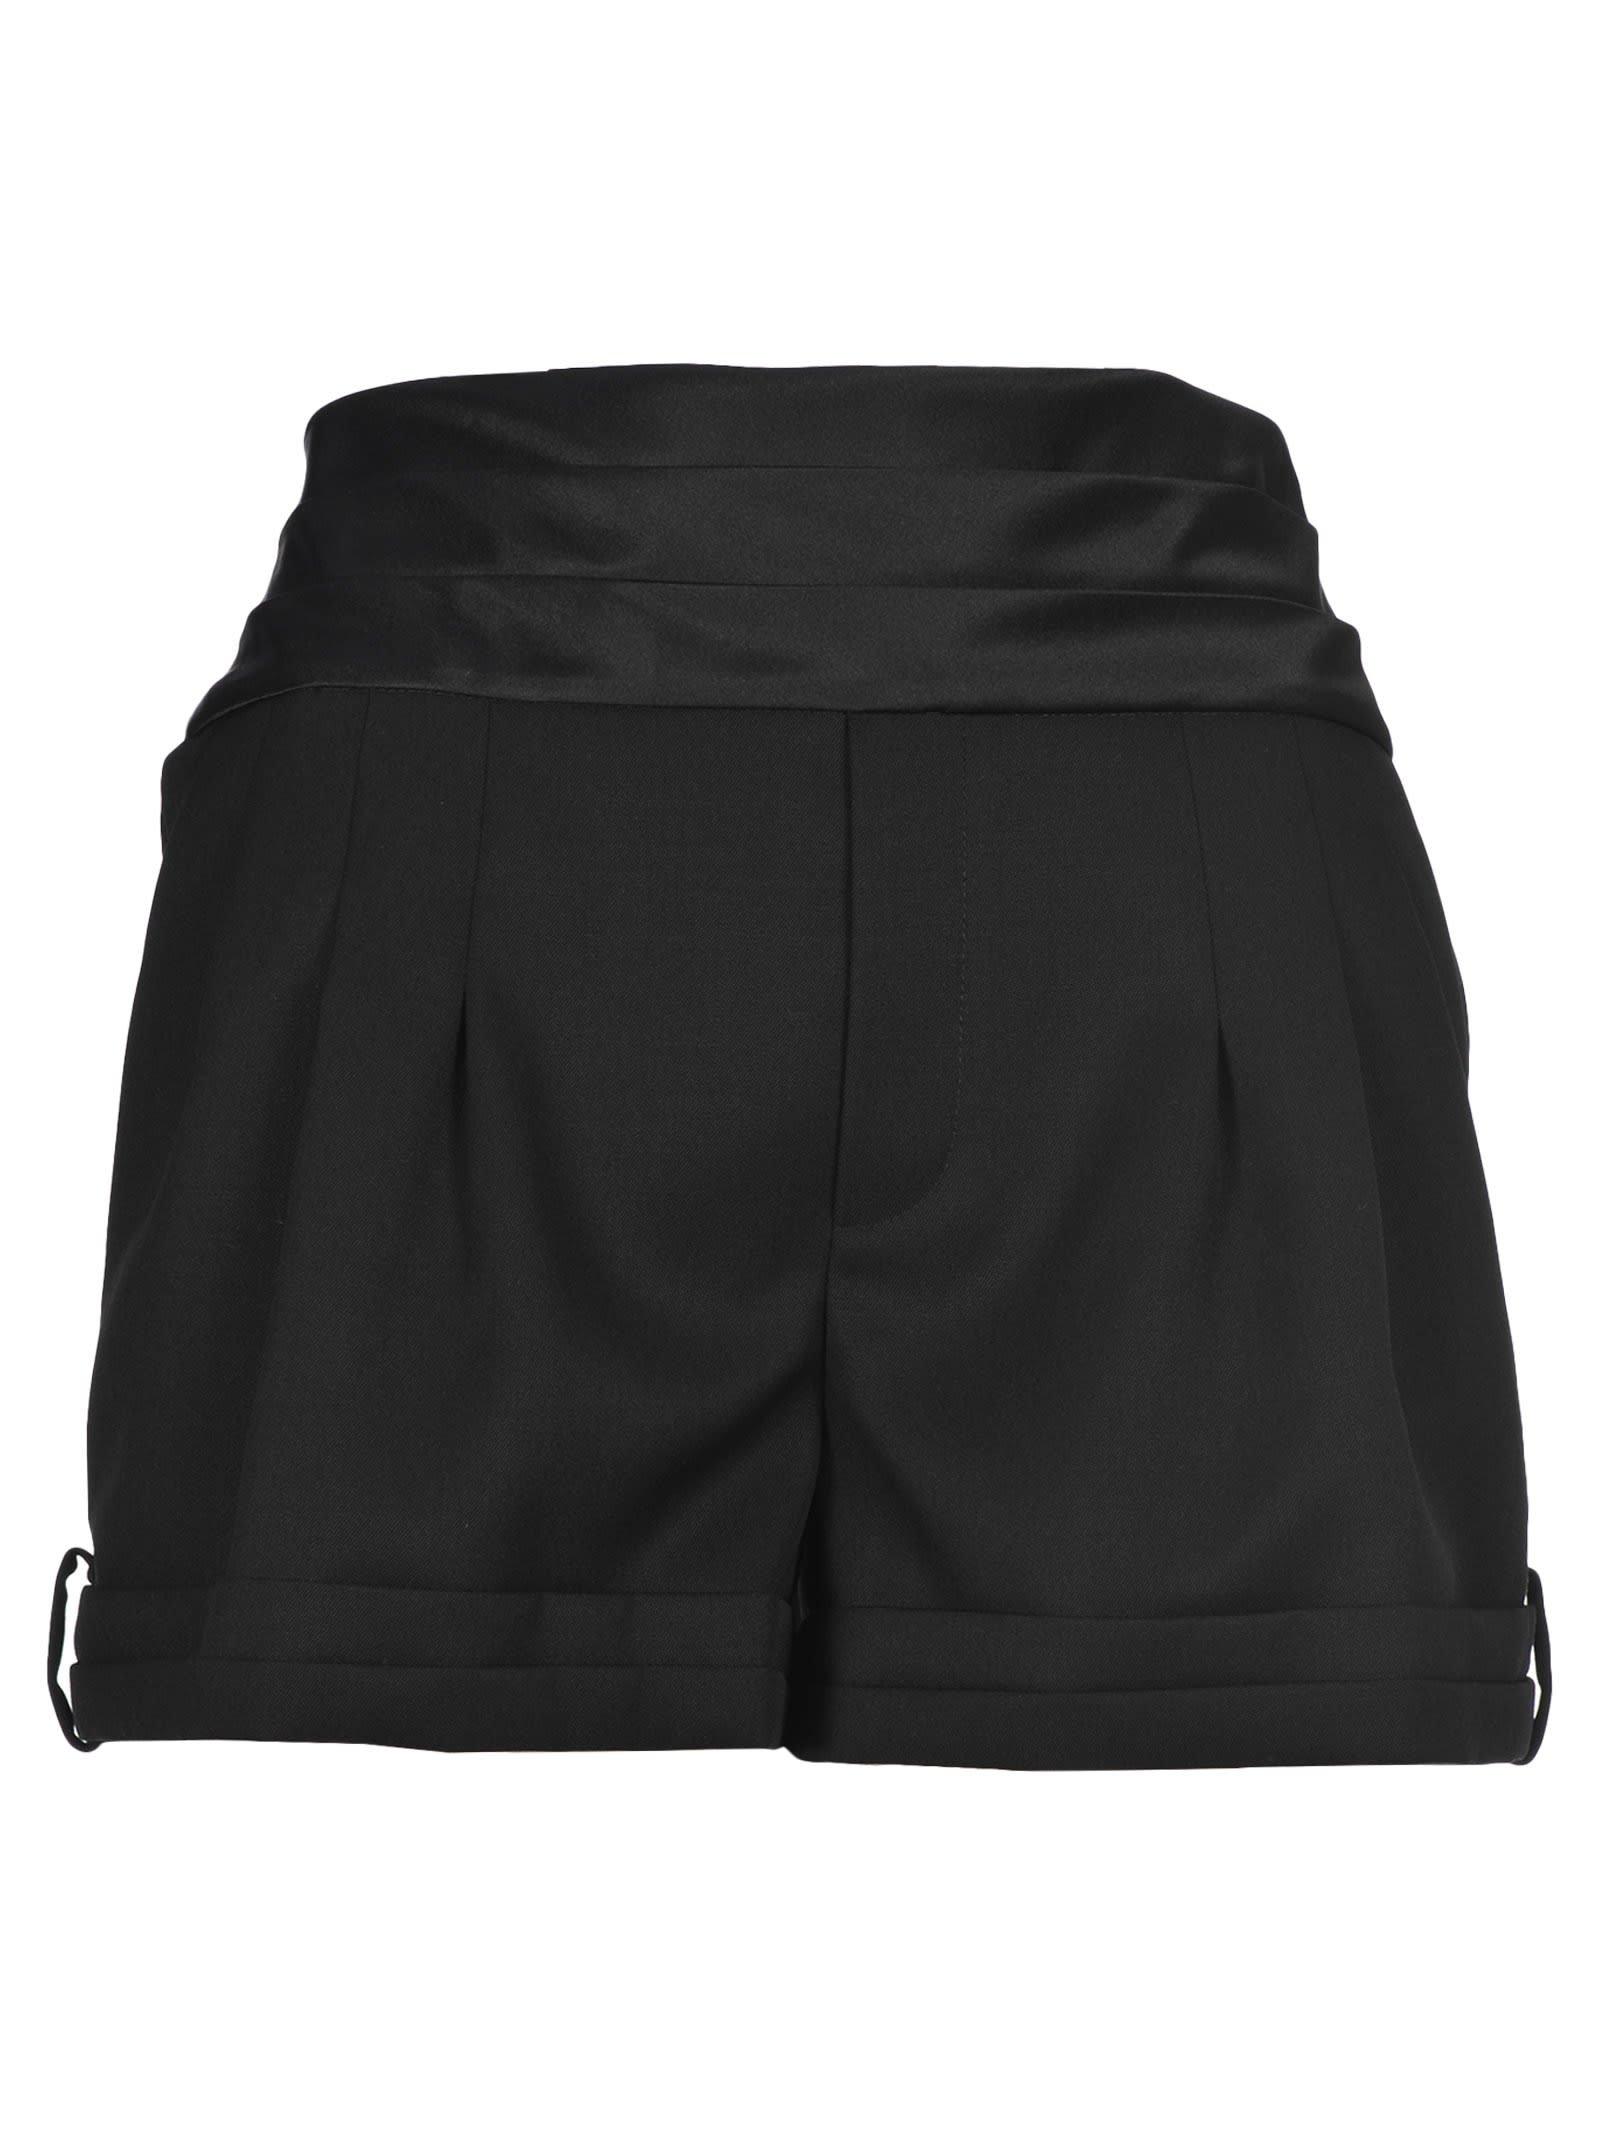 Saint Laurent Tuxedo Shorts